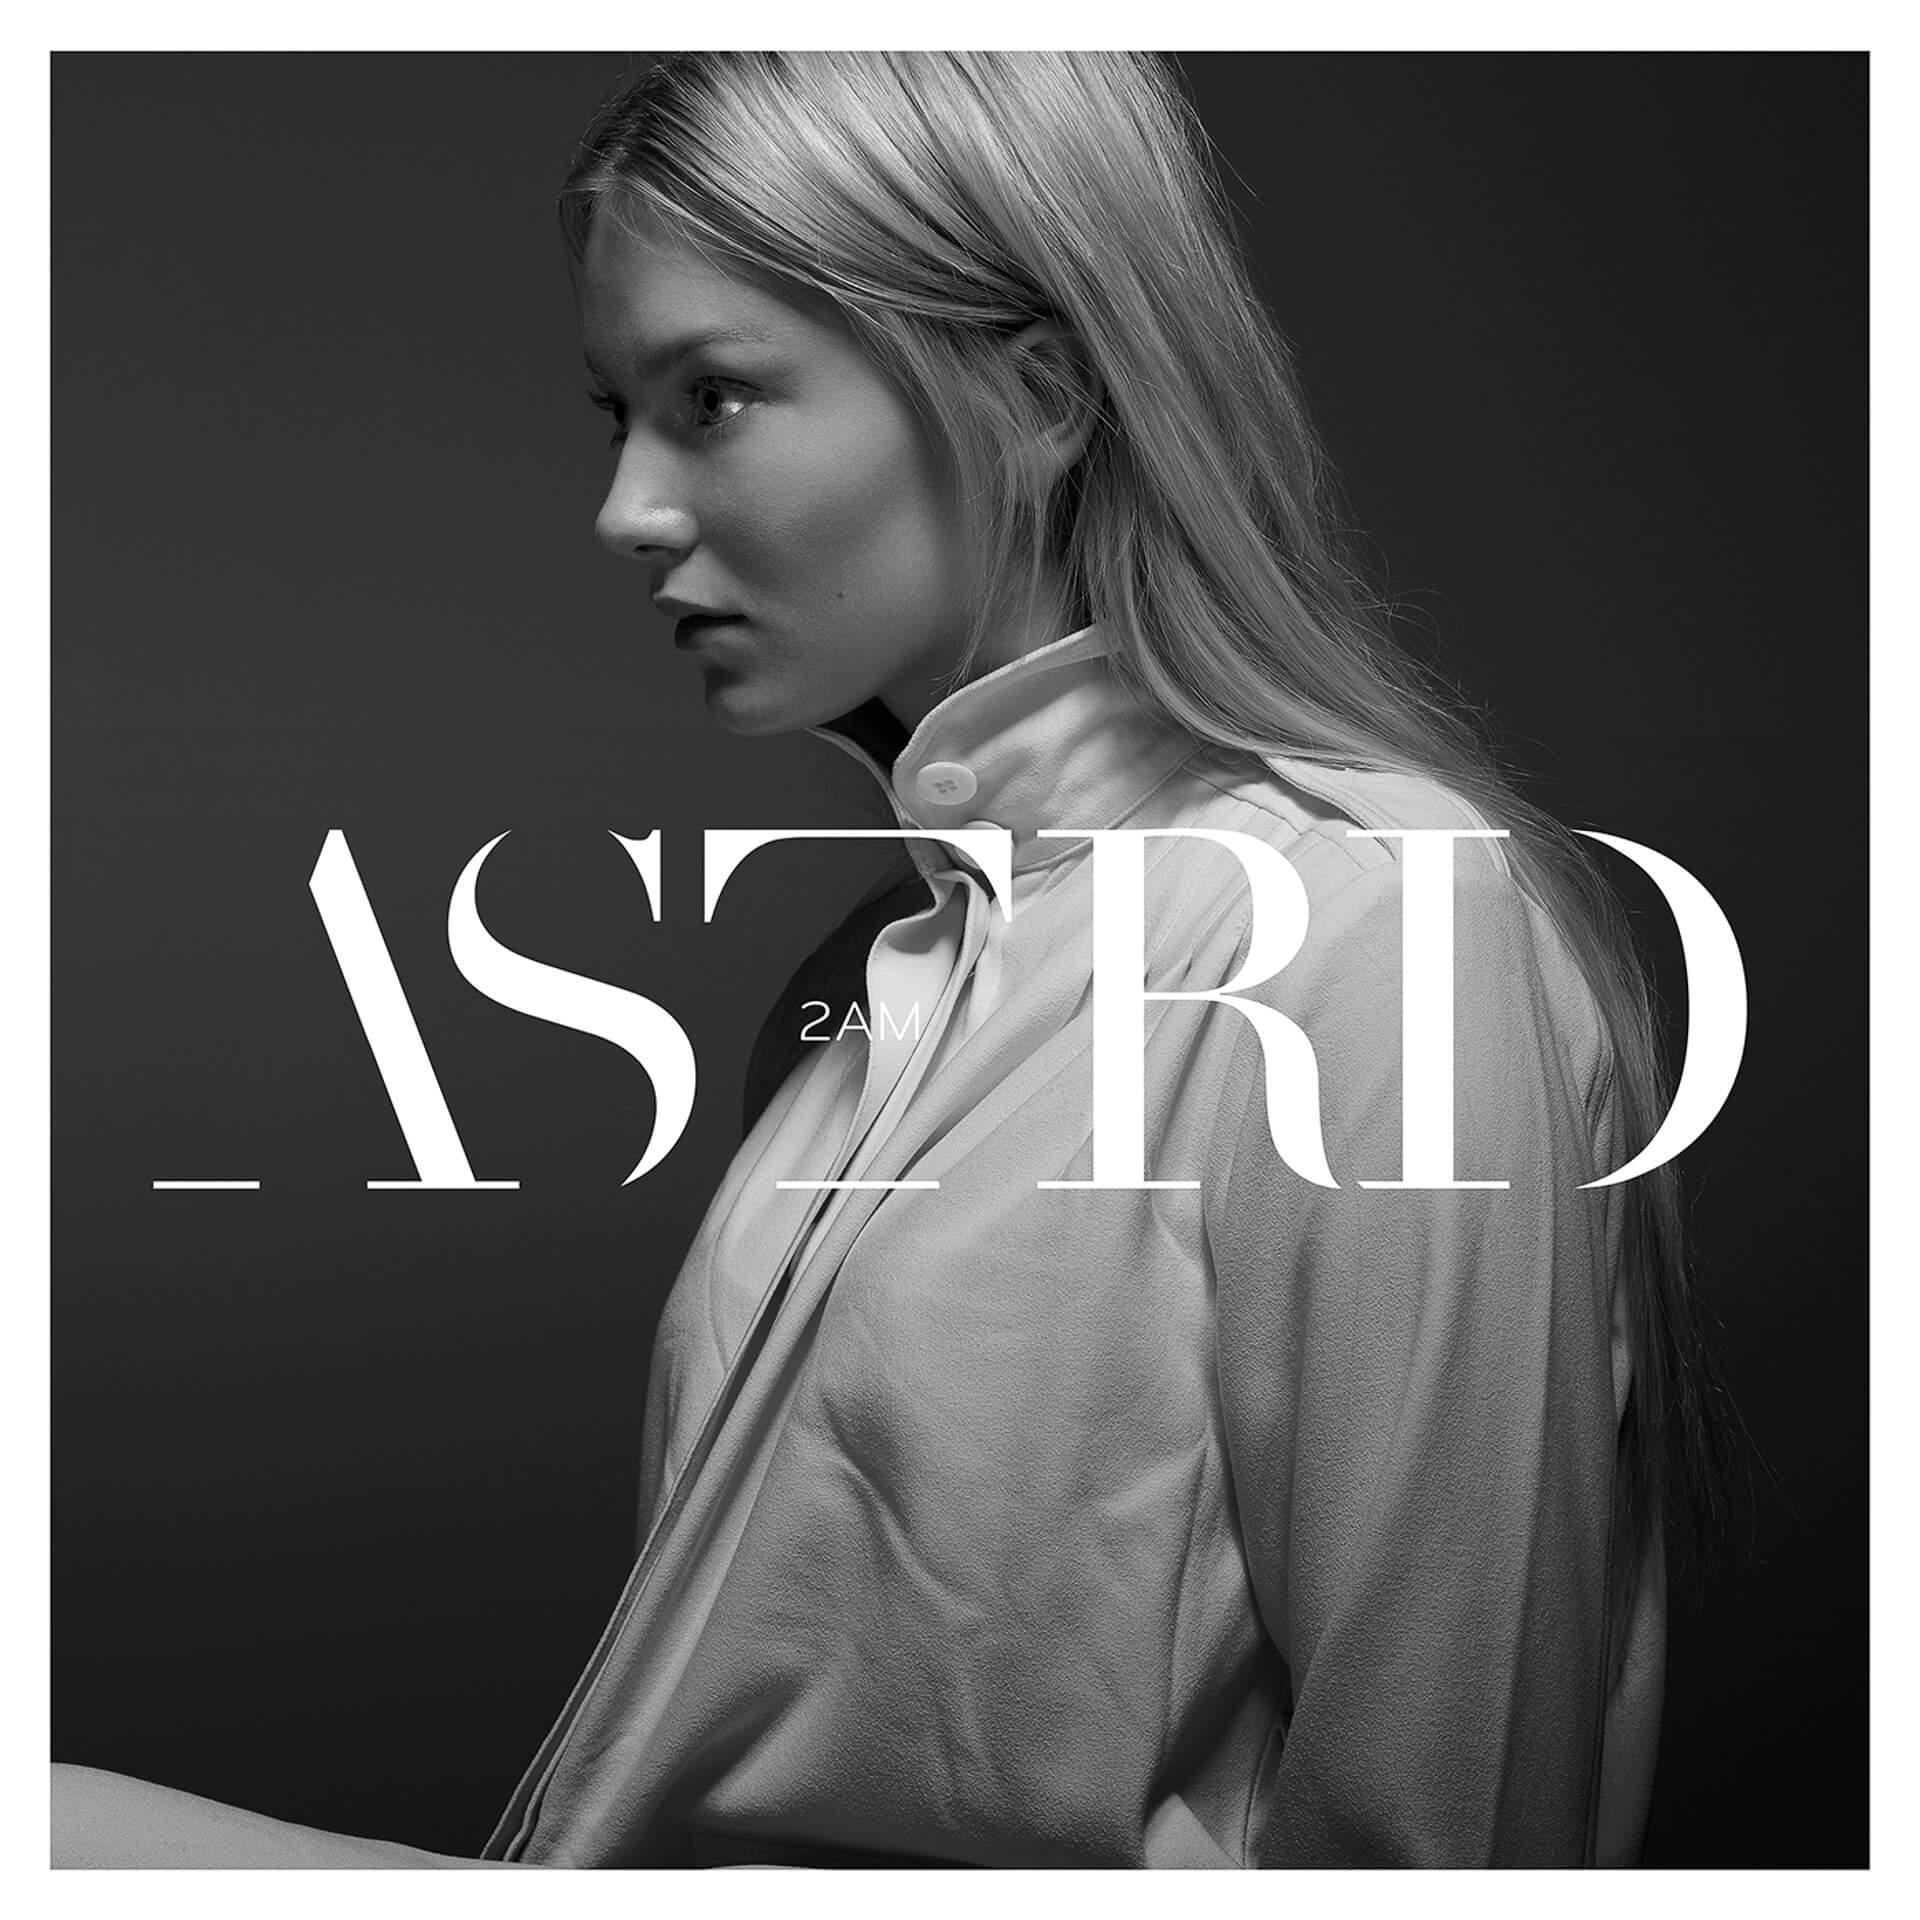 Astrid-2AM-CMYK-1400x1400px-300dpi